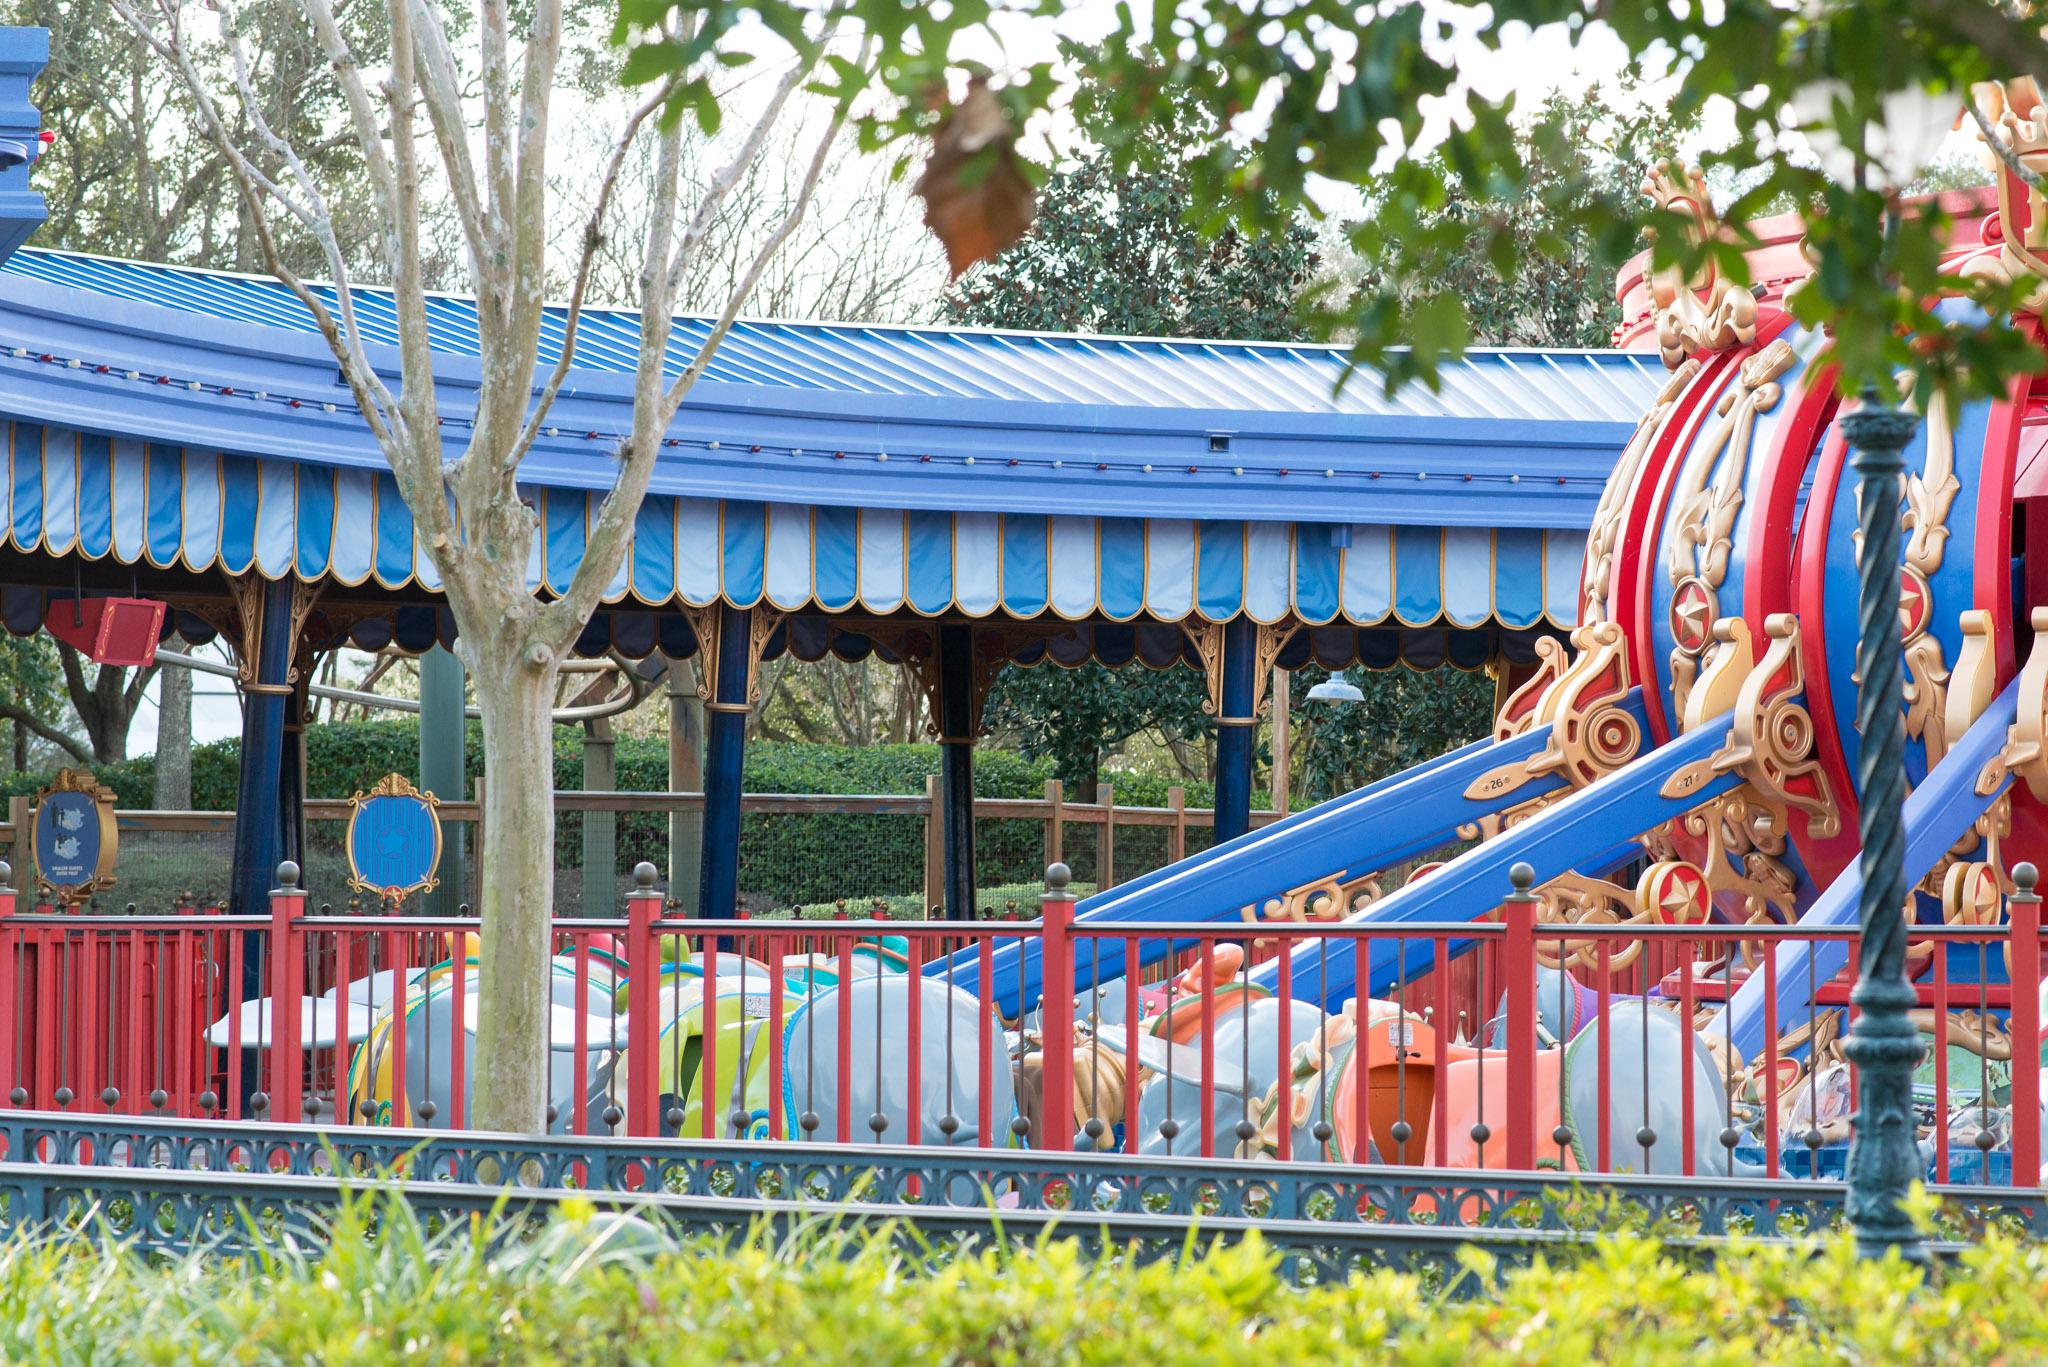 Dumbo Spinner Closed - Walt Disney World Magic Kingdom